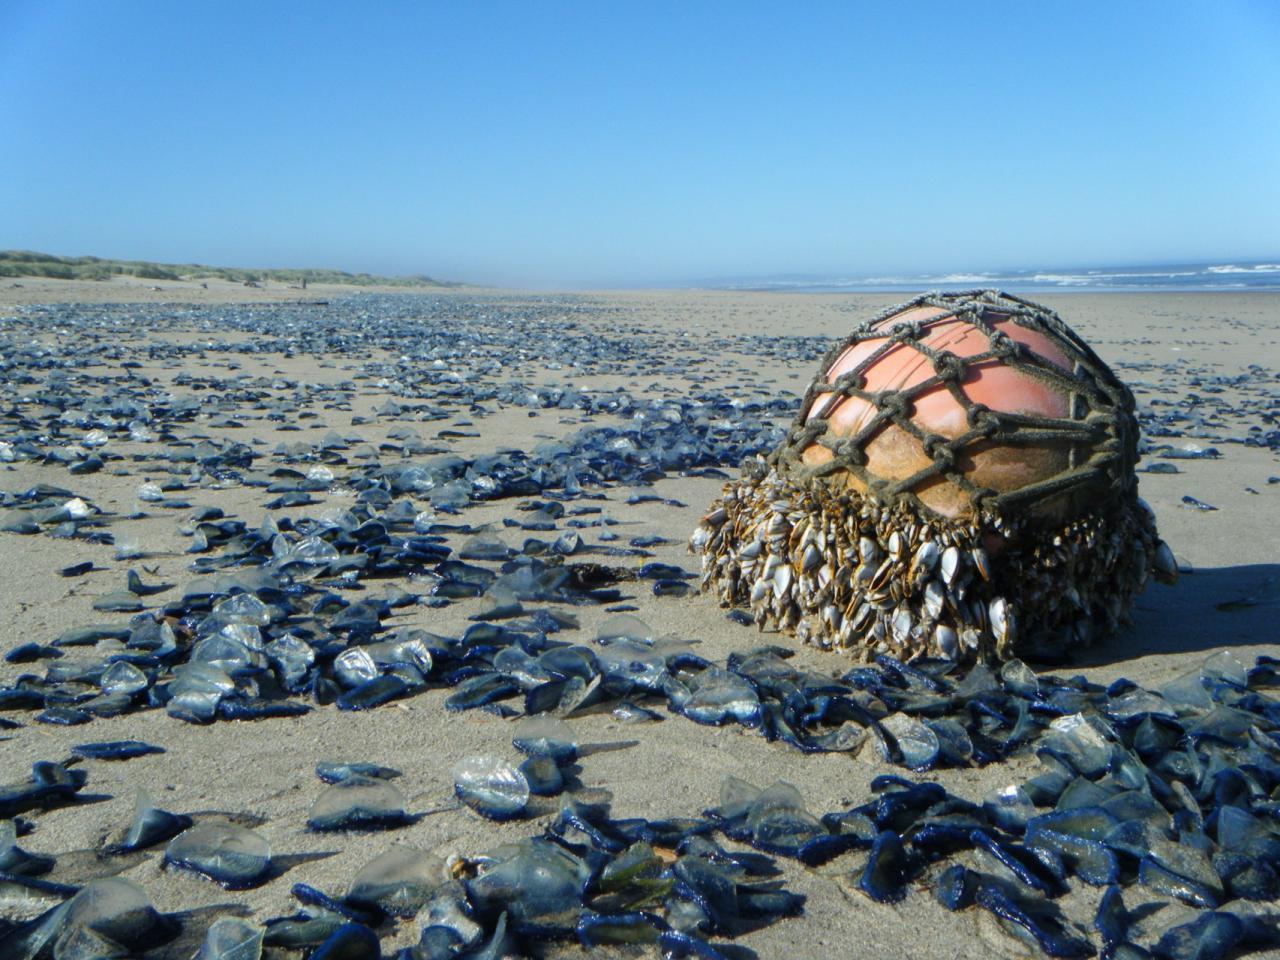 Mile 140 photo of float with gooseneck barnacles and large amounts of Velella jellyfish washed ashore.